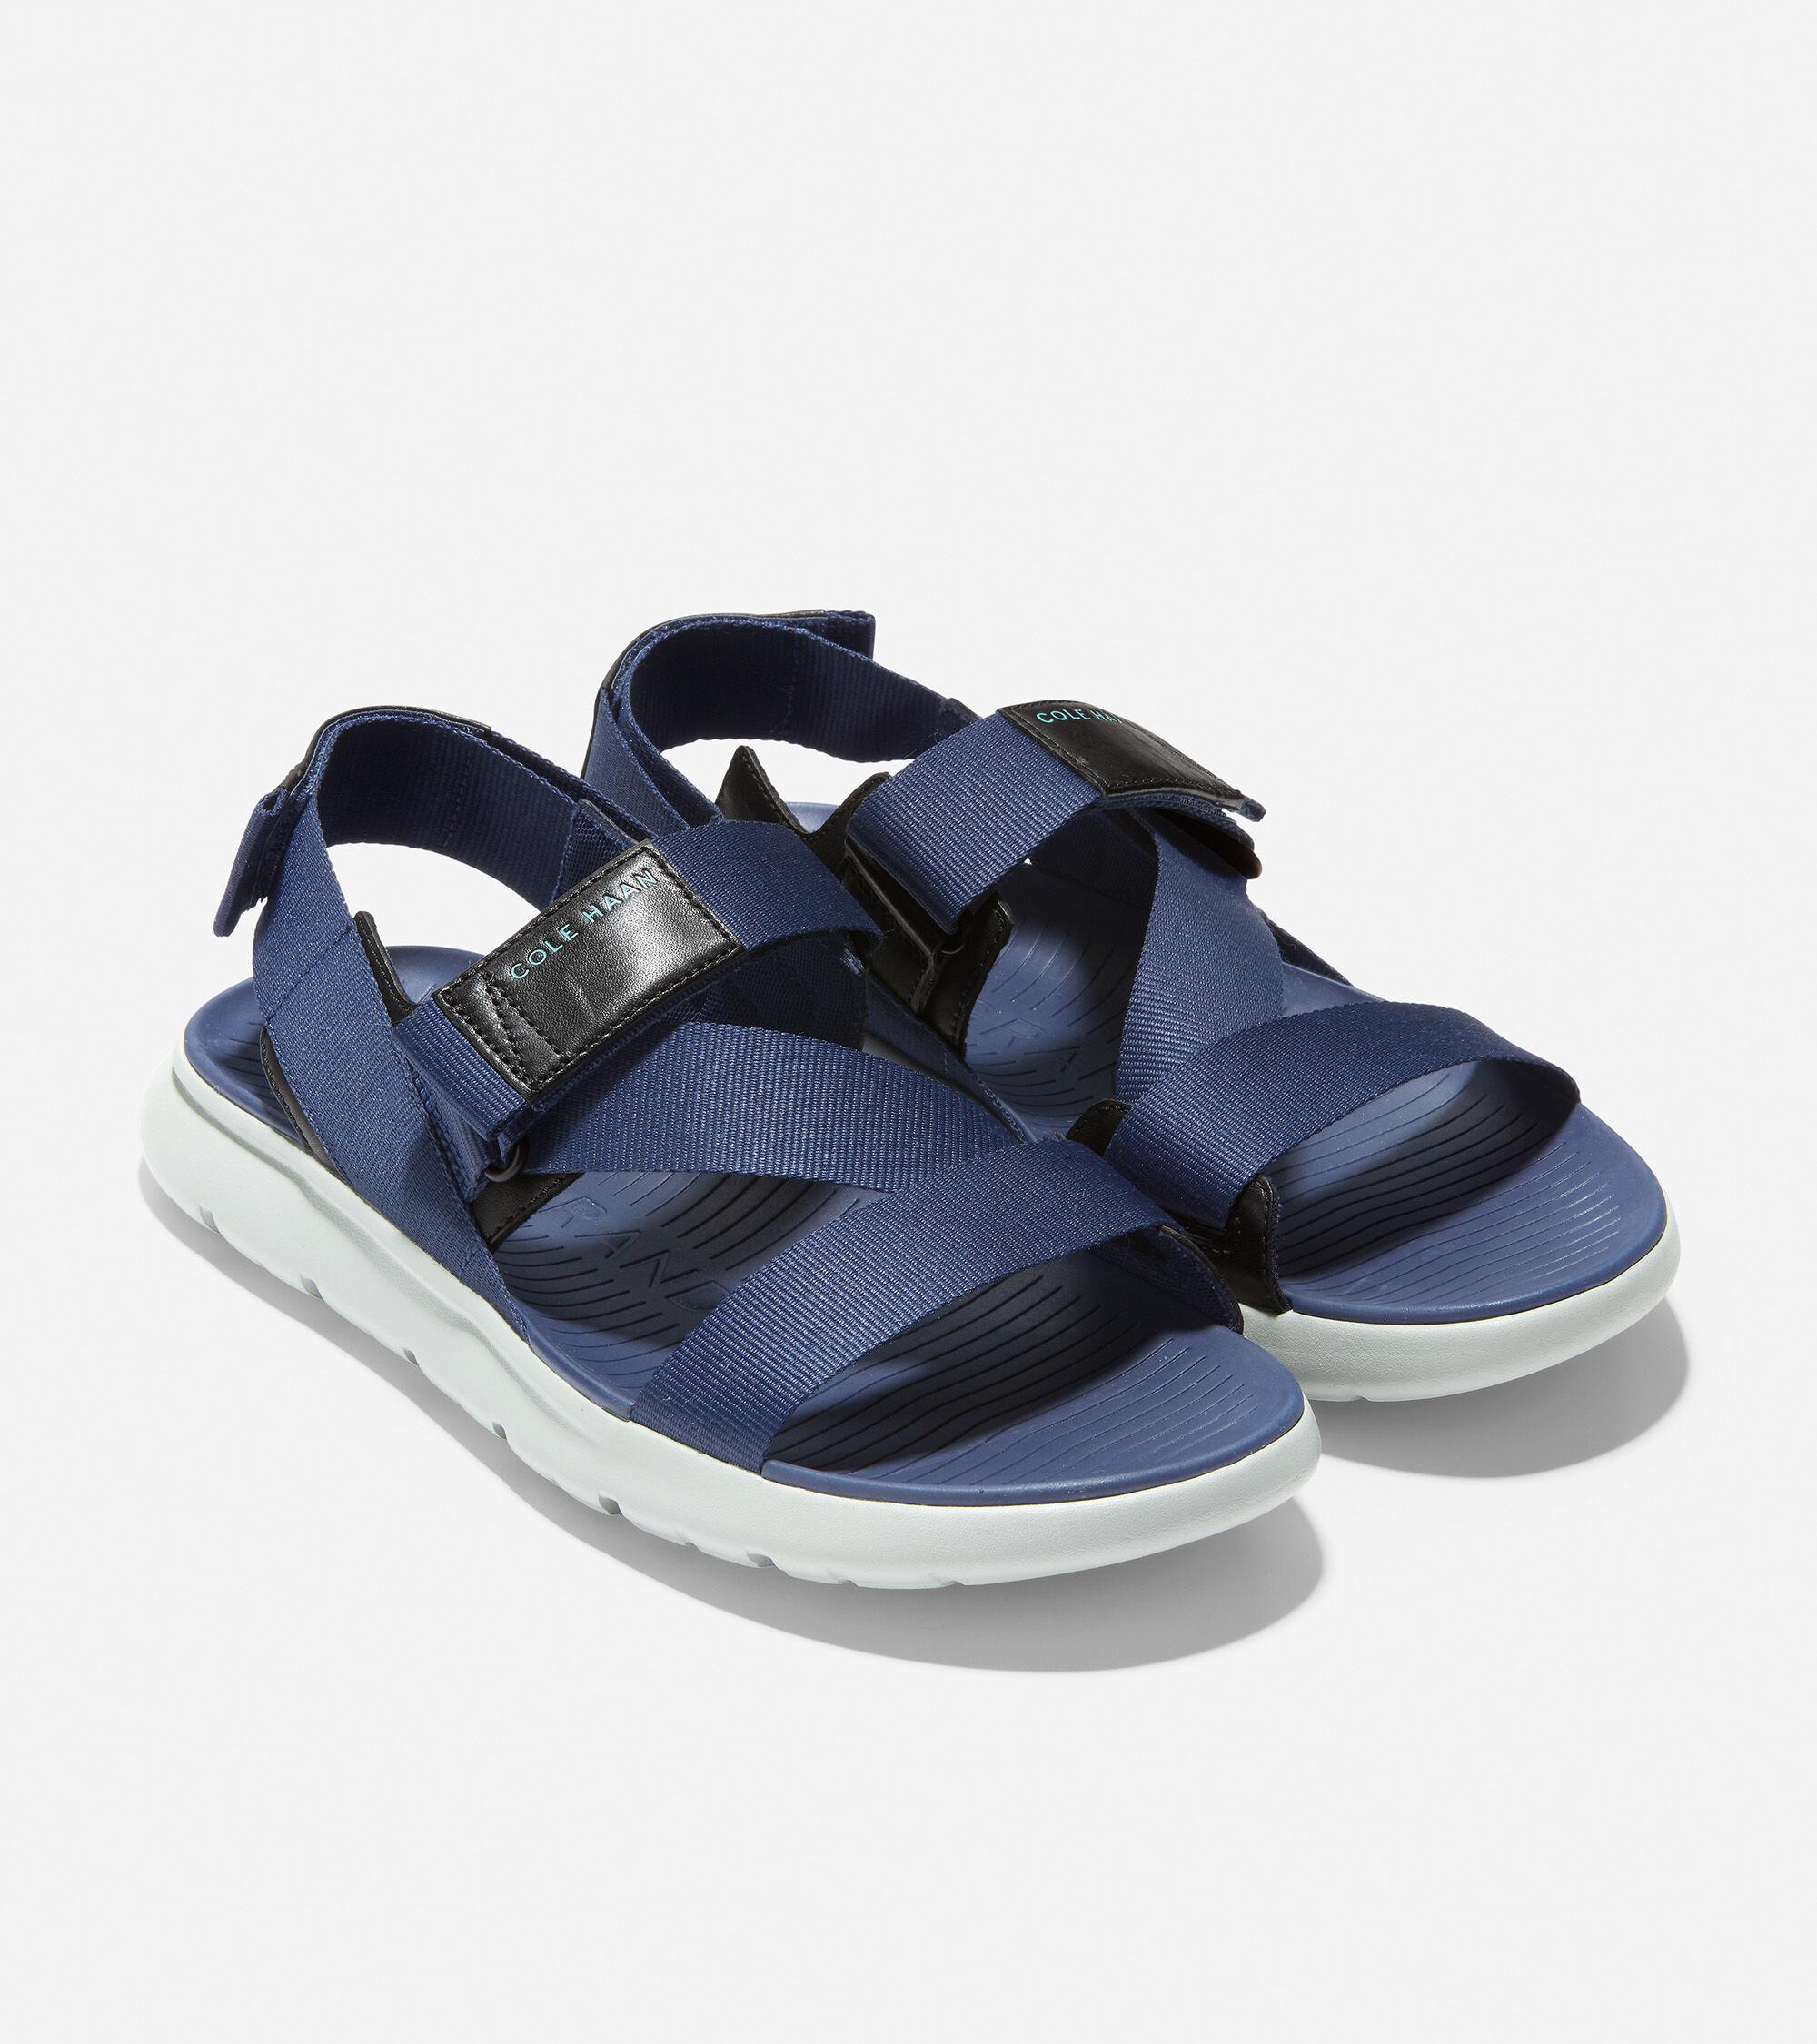 Explore Sandal in Marine Blue-Birch